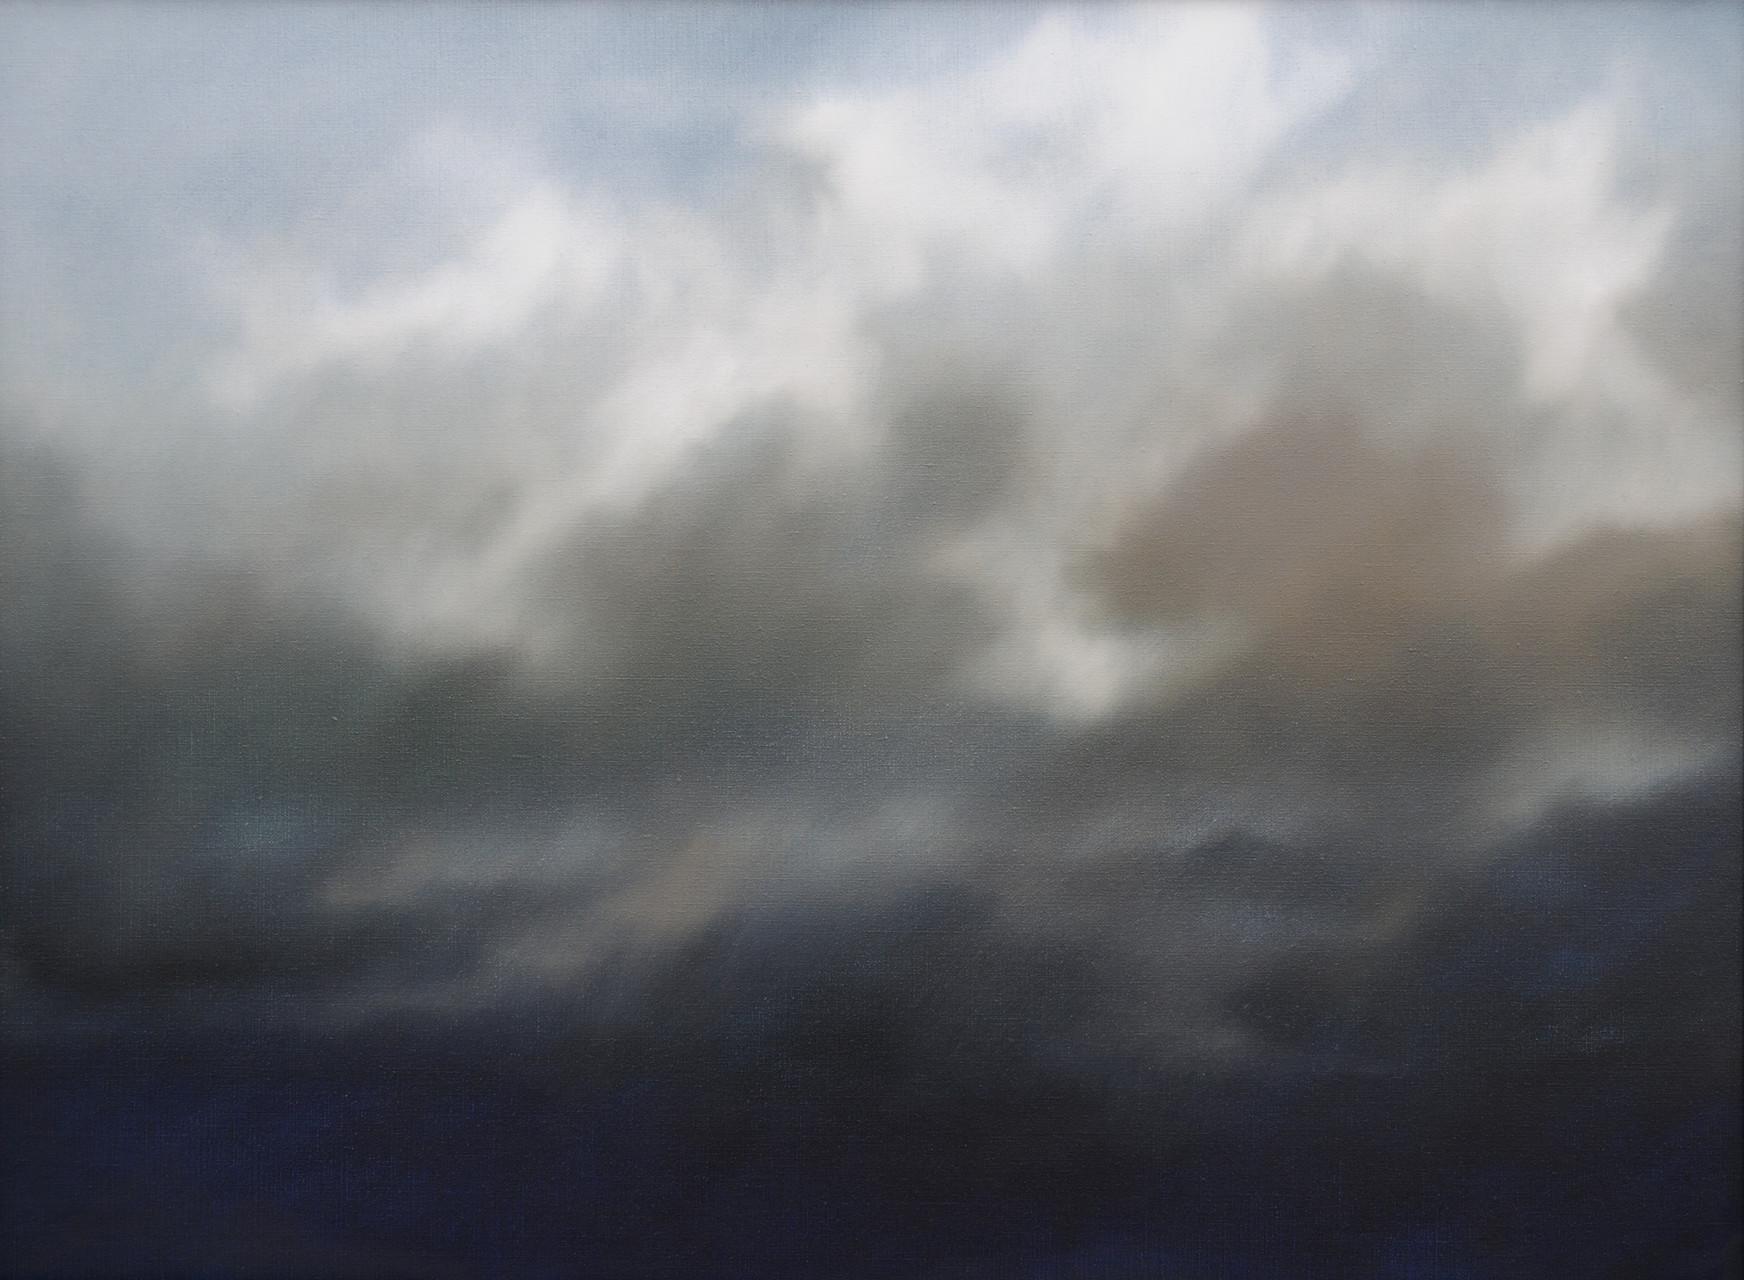 KOMPOSITION ... IN GEDANKEN AN DAS GOLDENE ZEITALTER, 2015, Öl/Lwd., 78 x 105cm